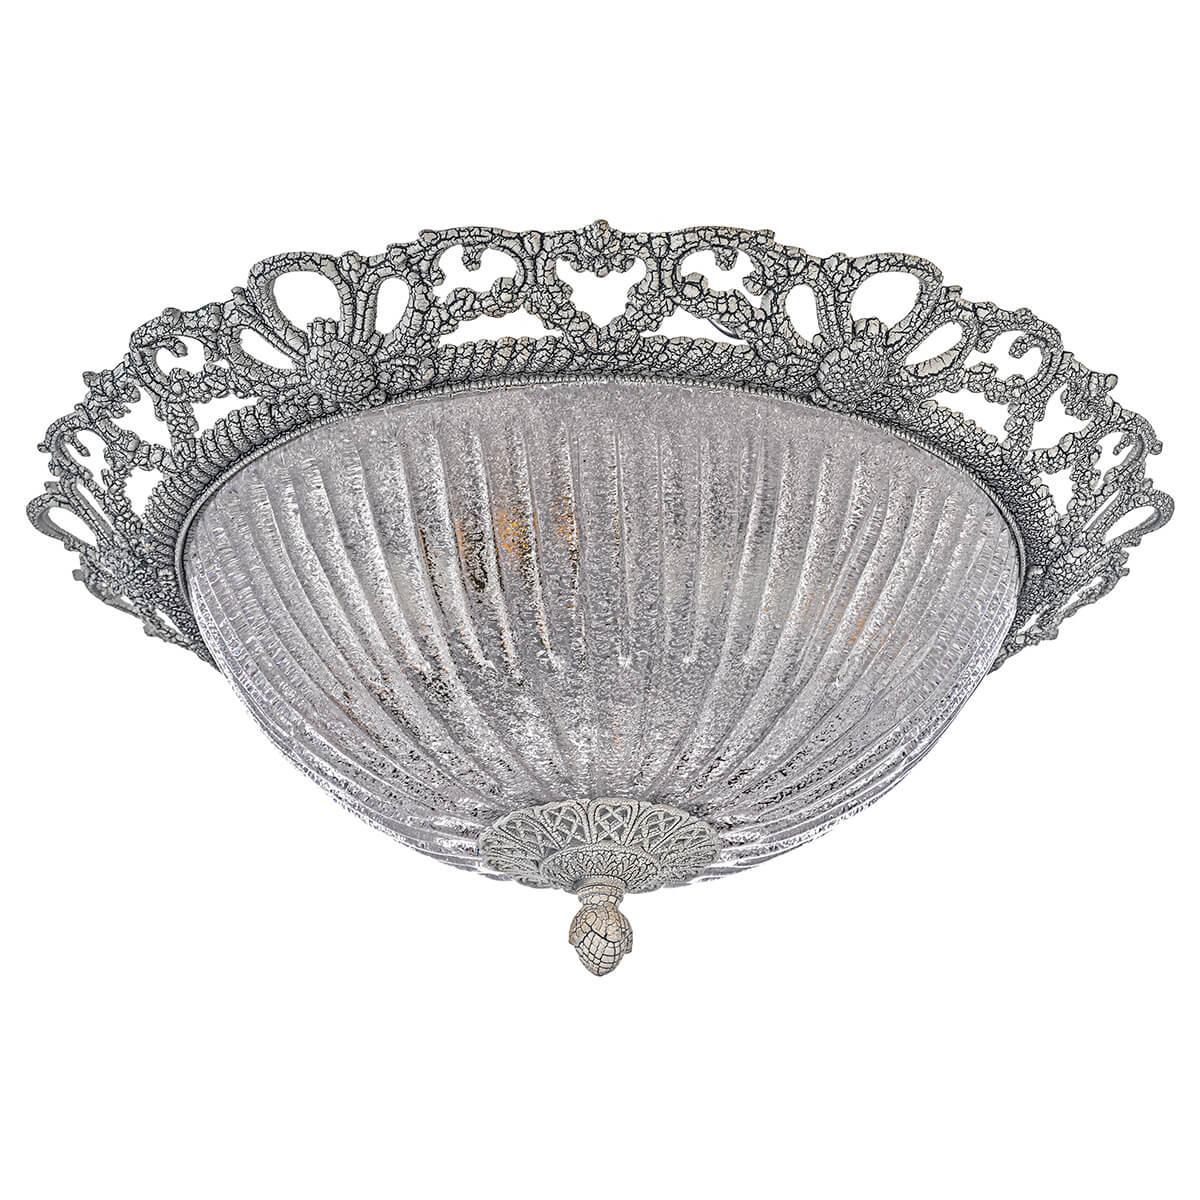 Потолочный светильник Arti Lampadari Vigilanza E 1.13.46 BW цена и фото